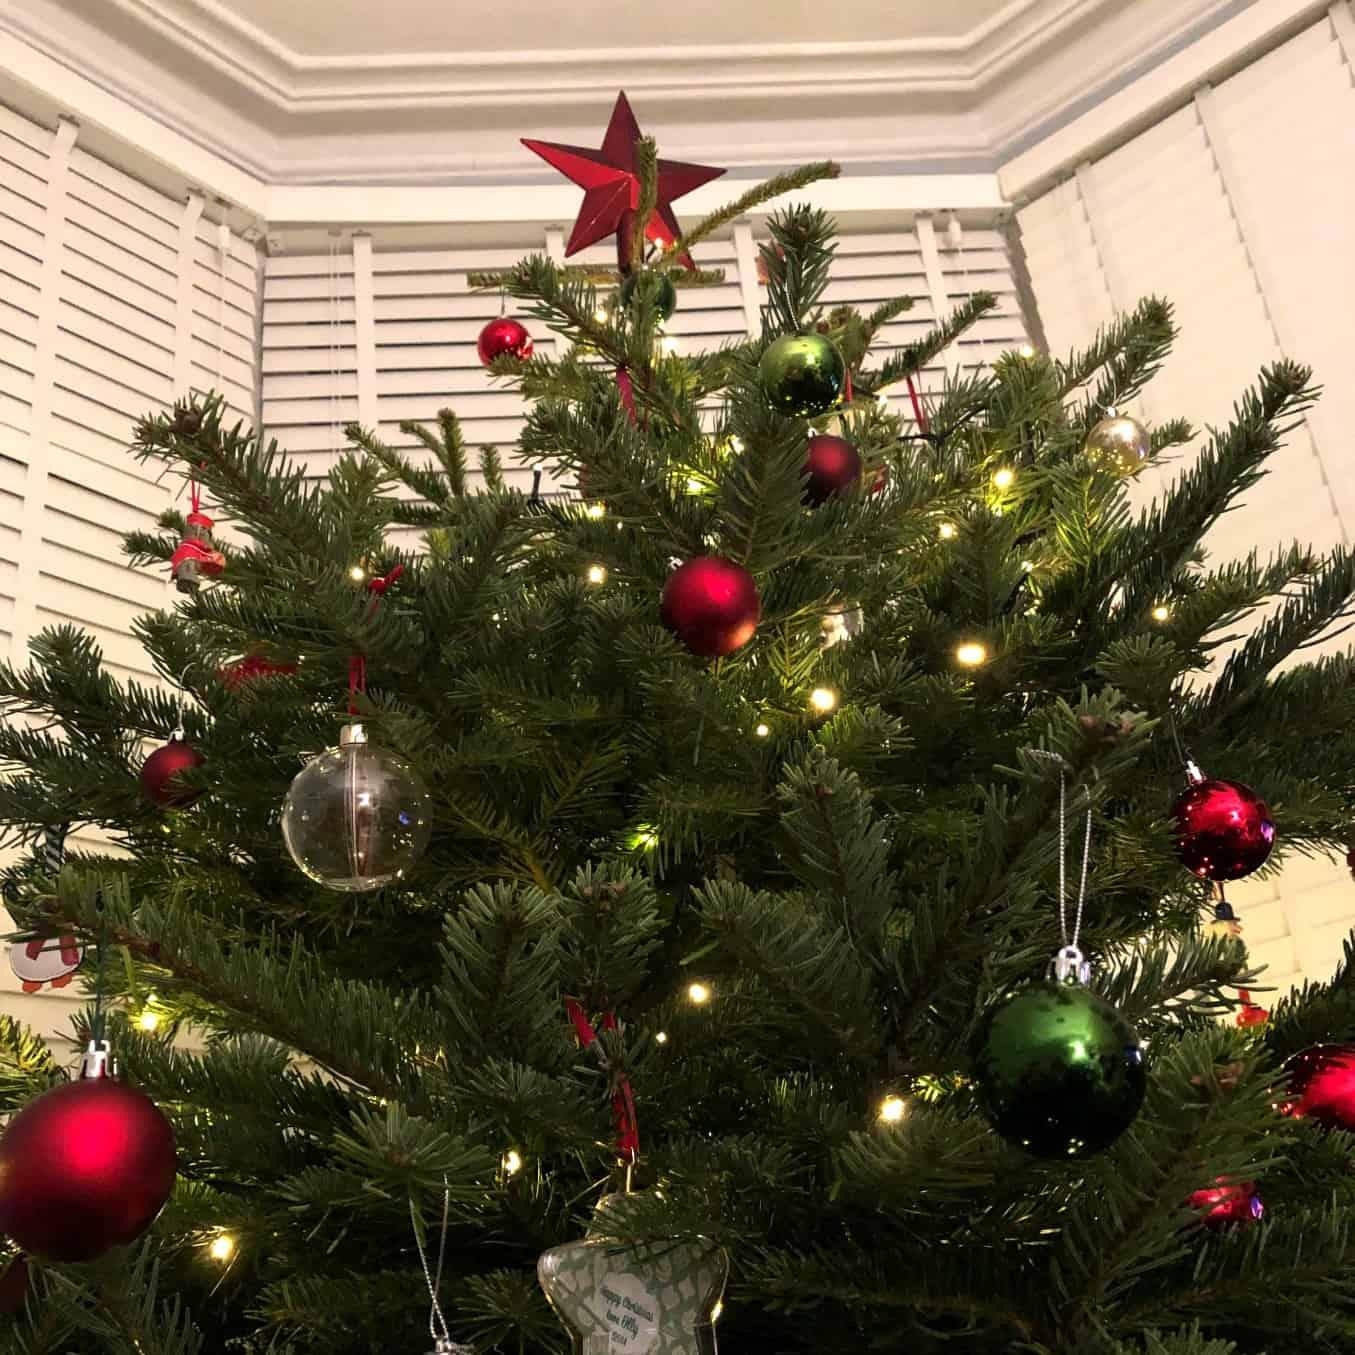 Pines and Needles Christmas Tree 2018